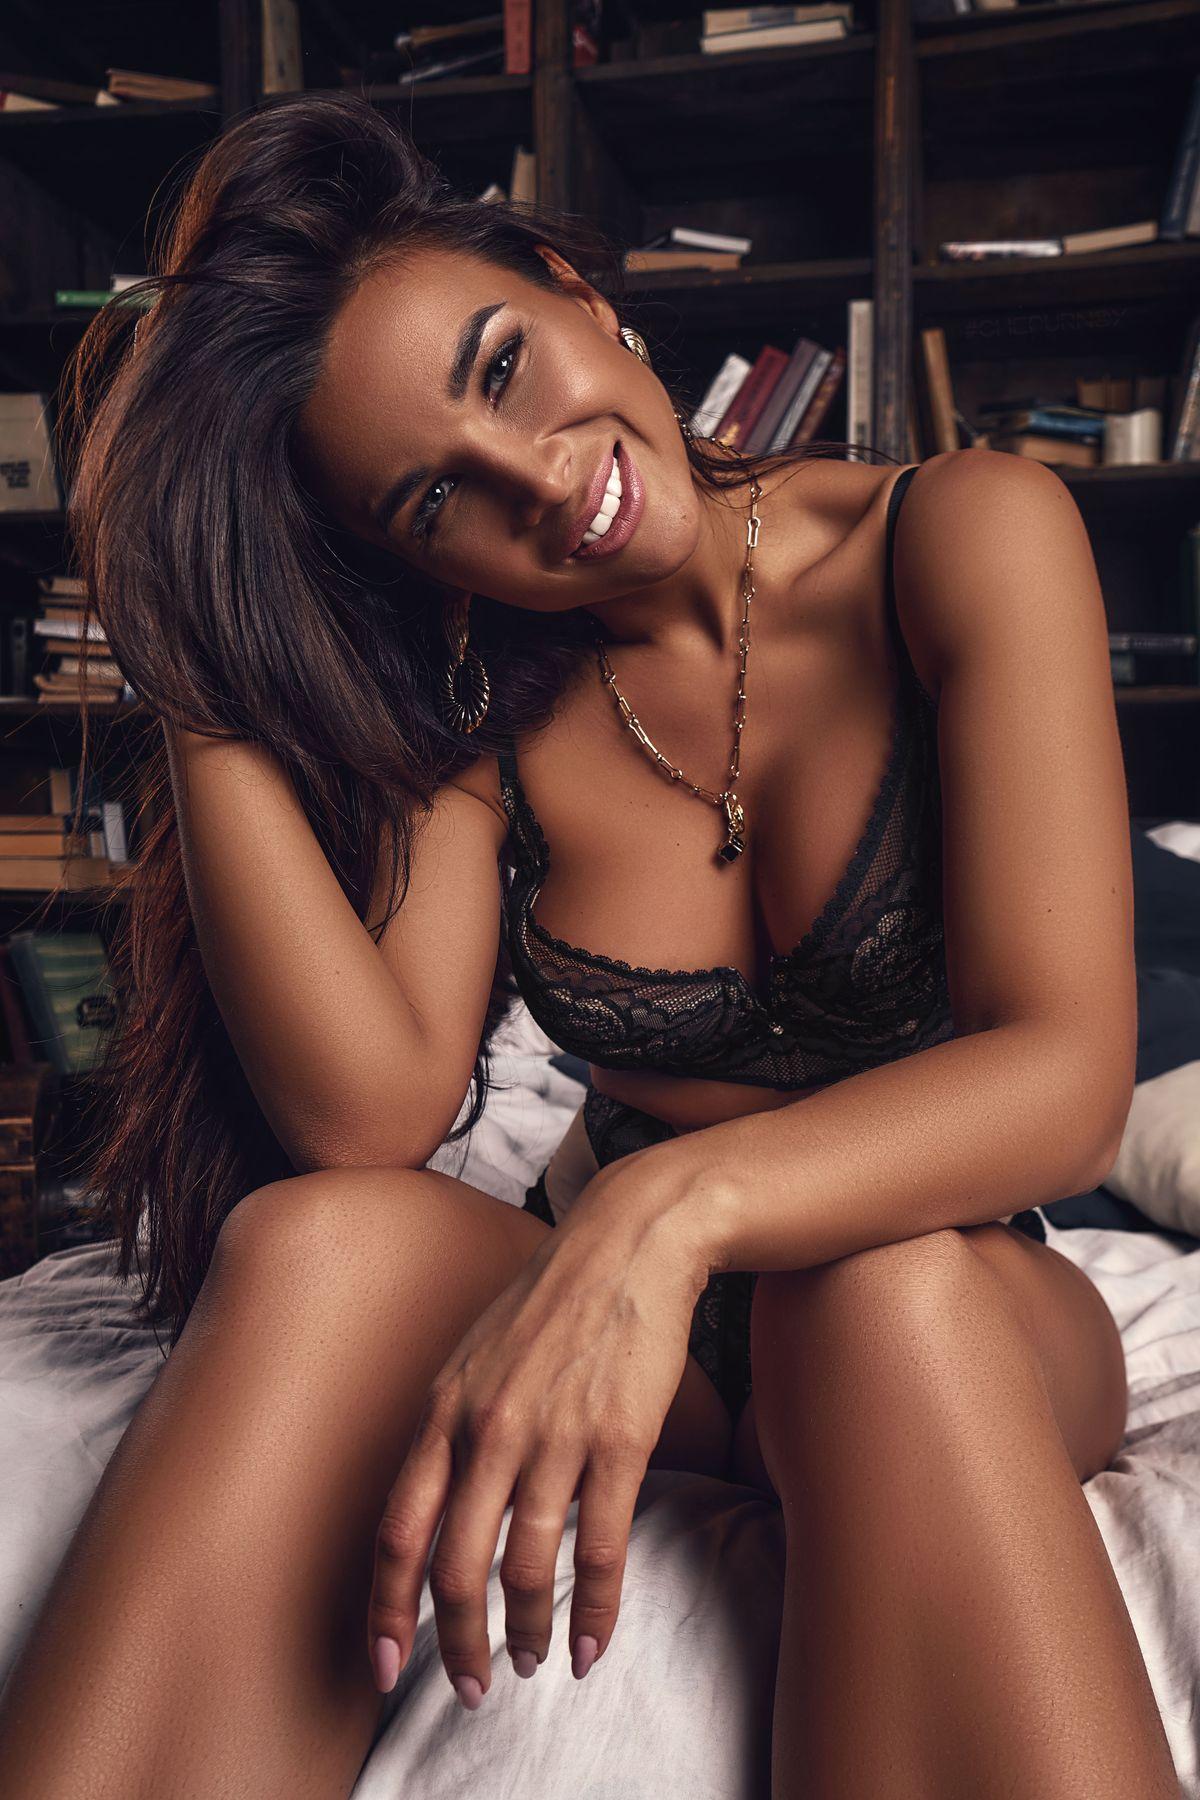 Albina girl girls woman portrait lingerie девушки красивая